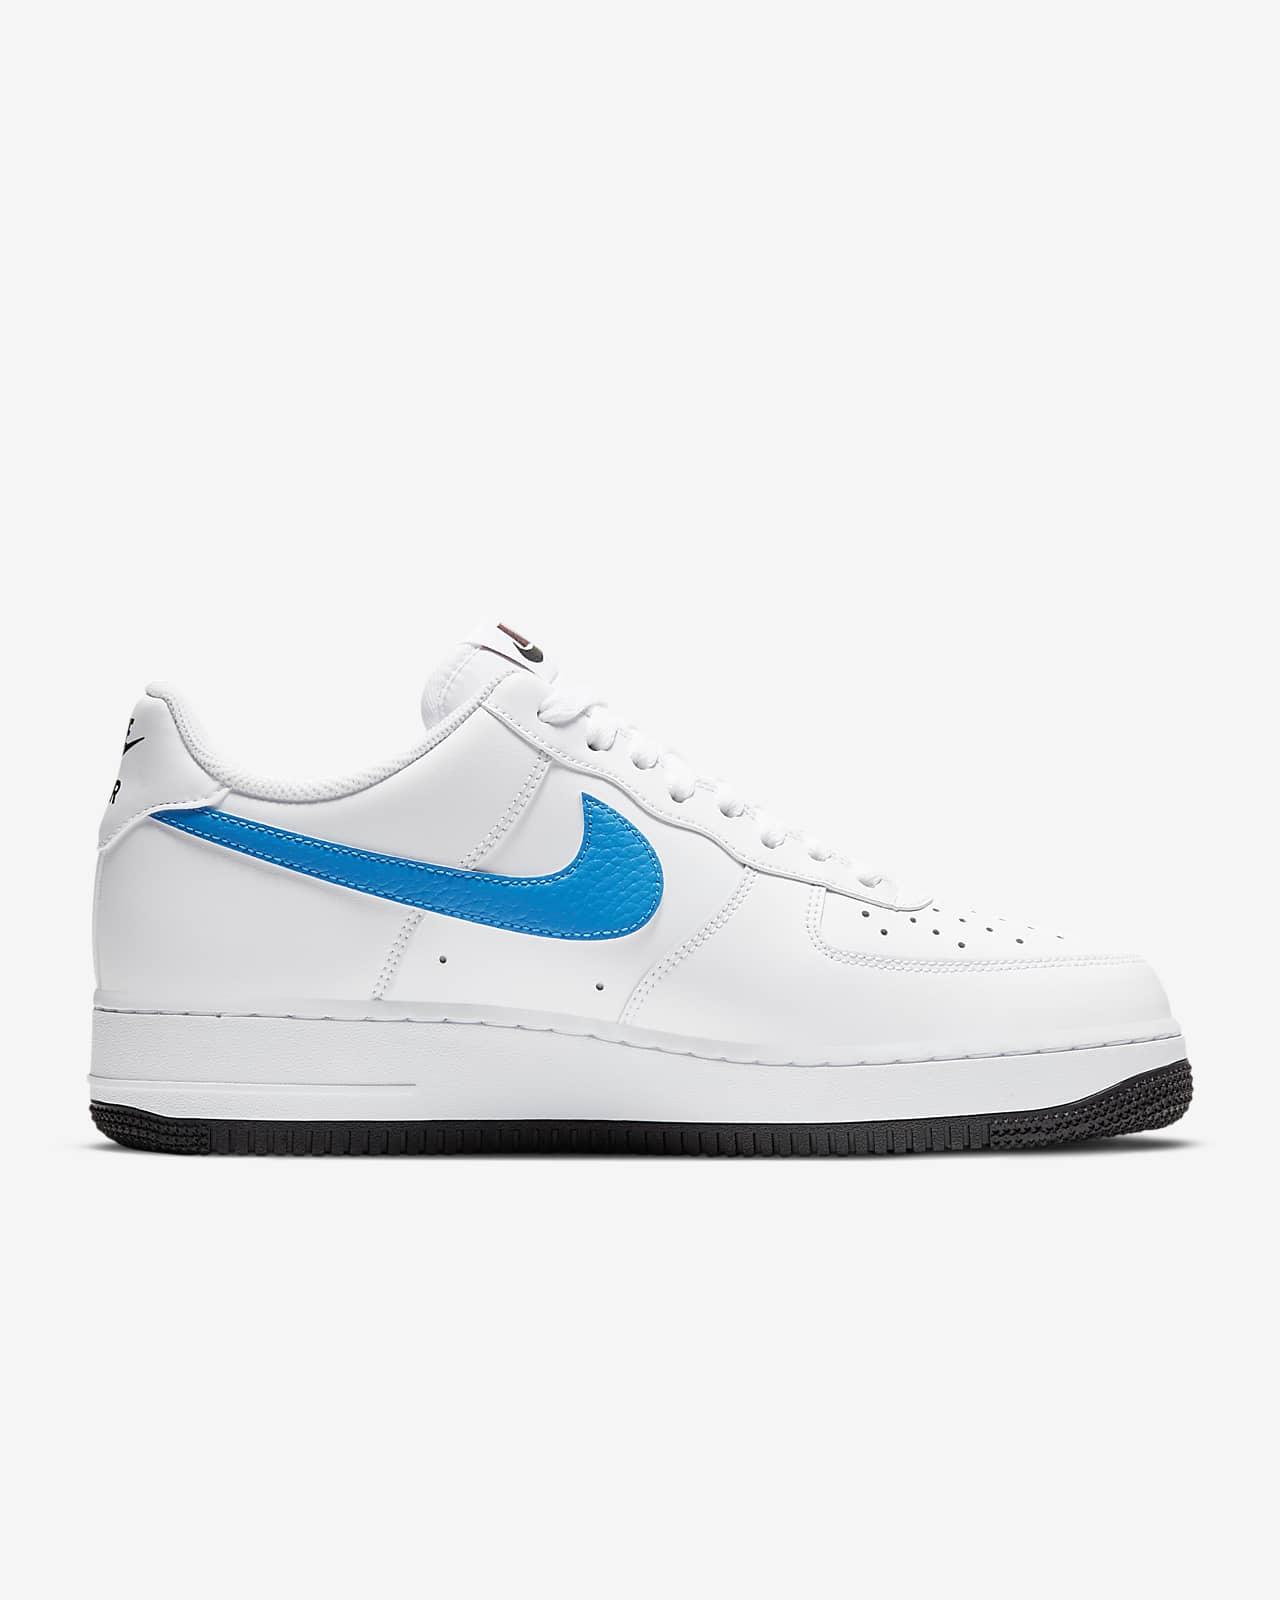 Nike Air Force 1 '07 Men's Shoe. Nike SG